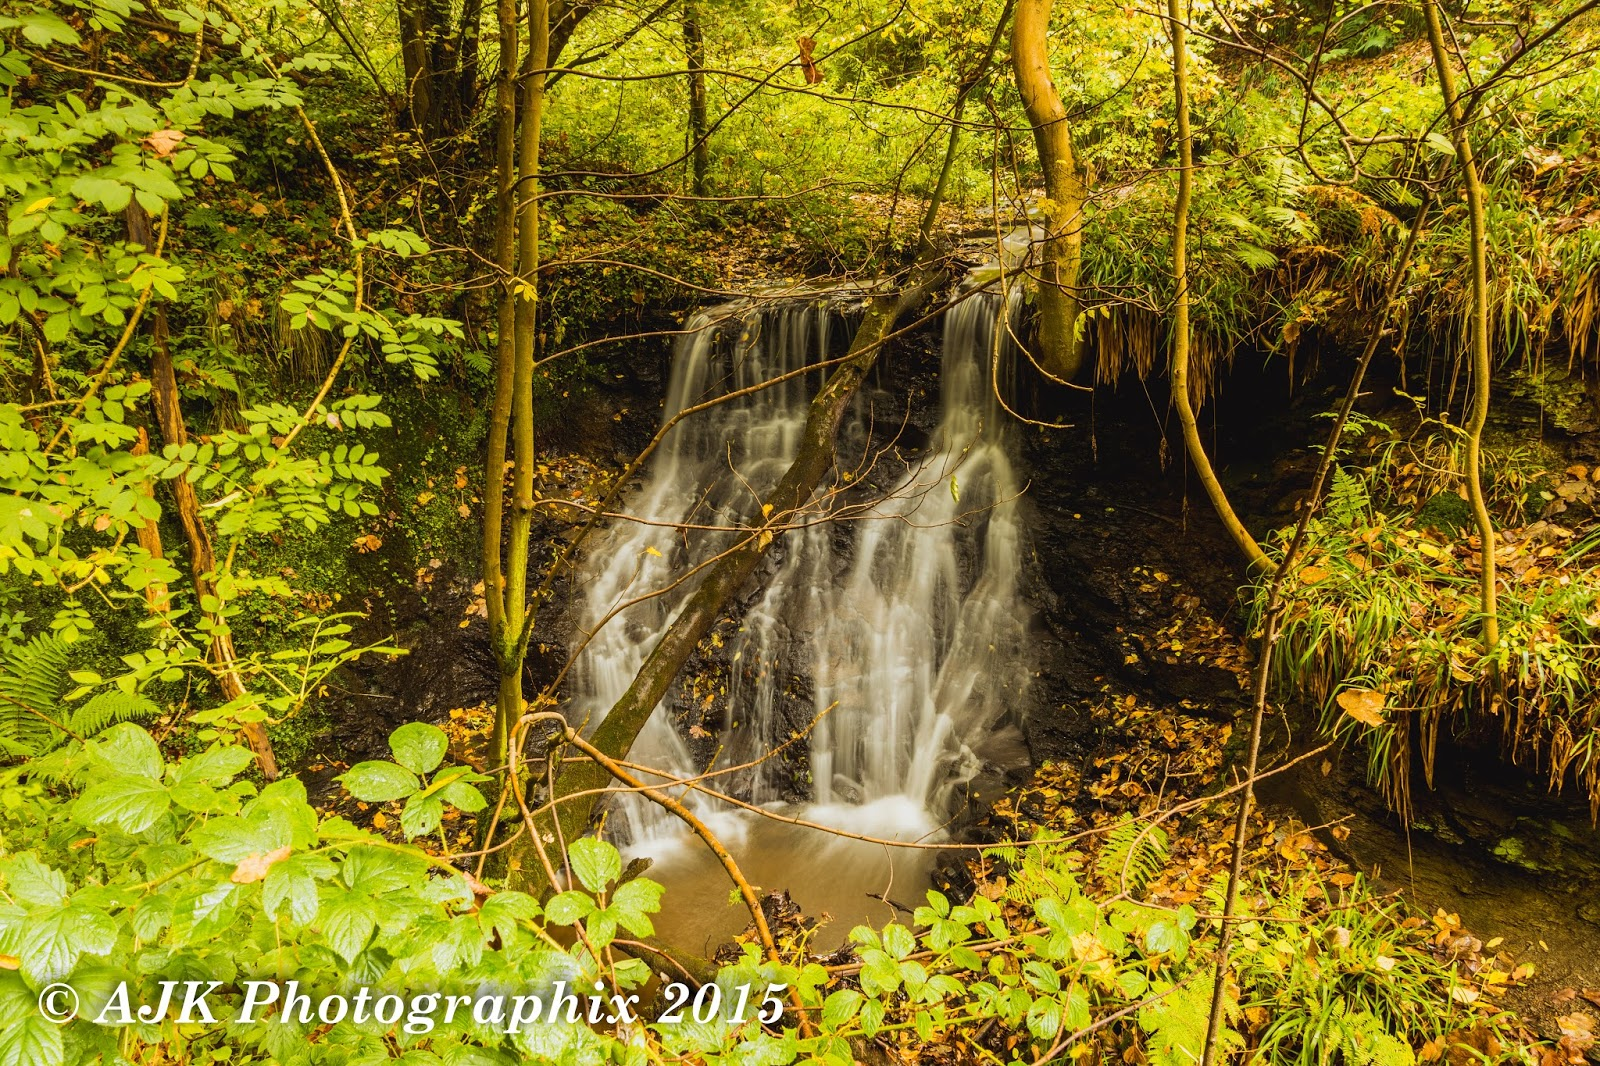 Yorkshire Waterfalls: Kildale Falls (aka